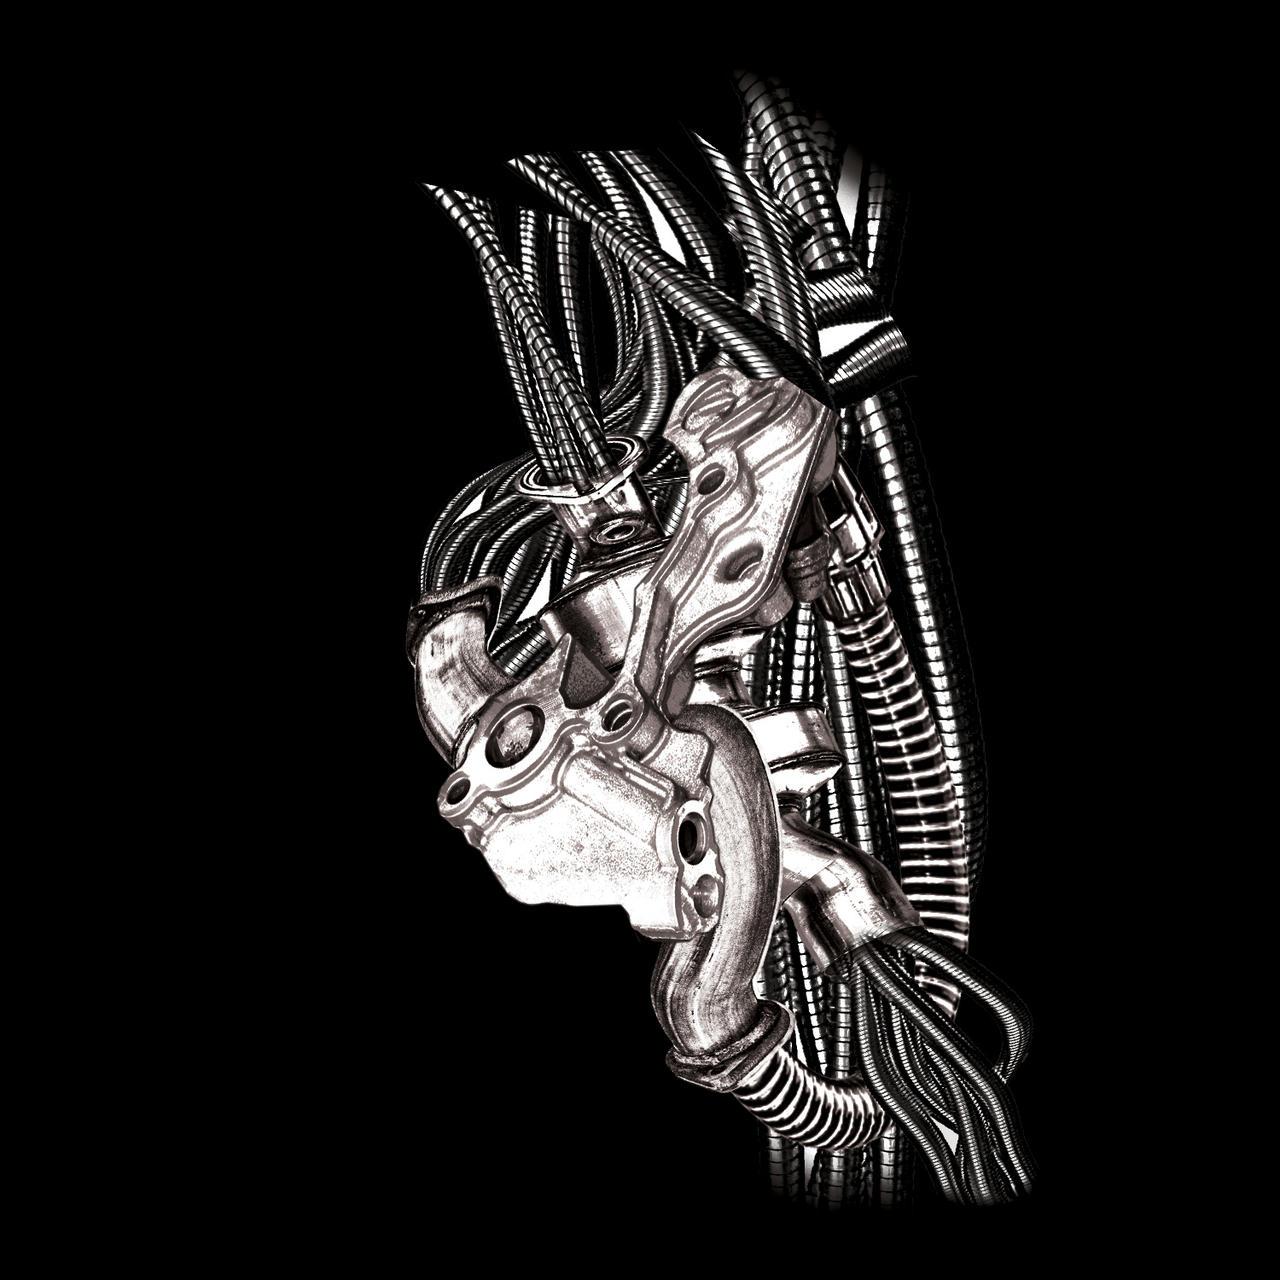 Biomechanical Tattoo by PoetVogon on DeviantArt